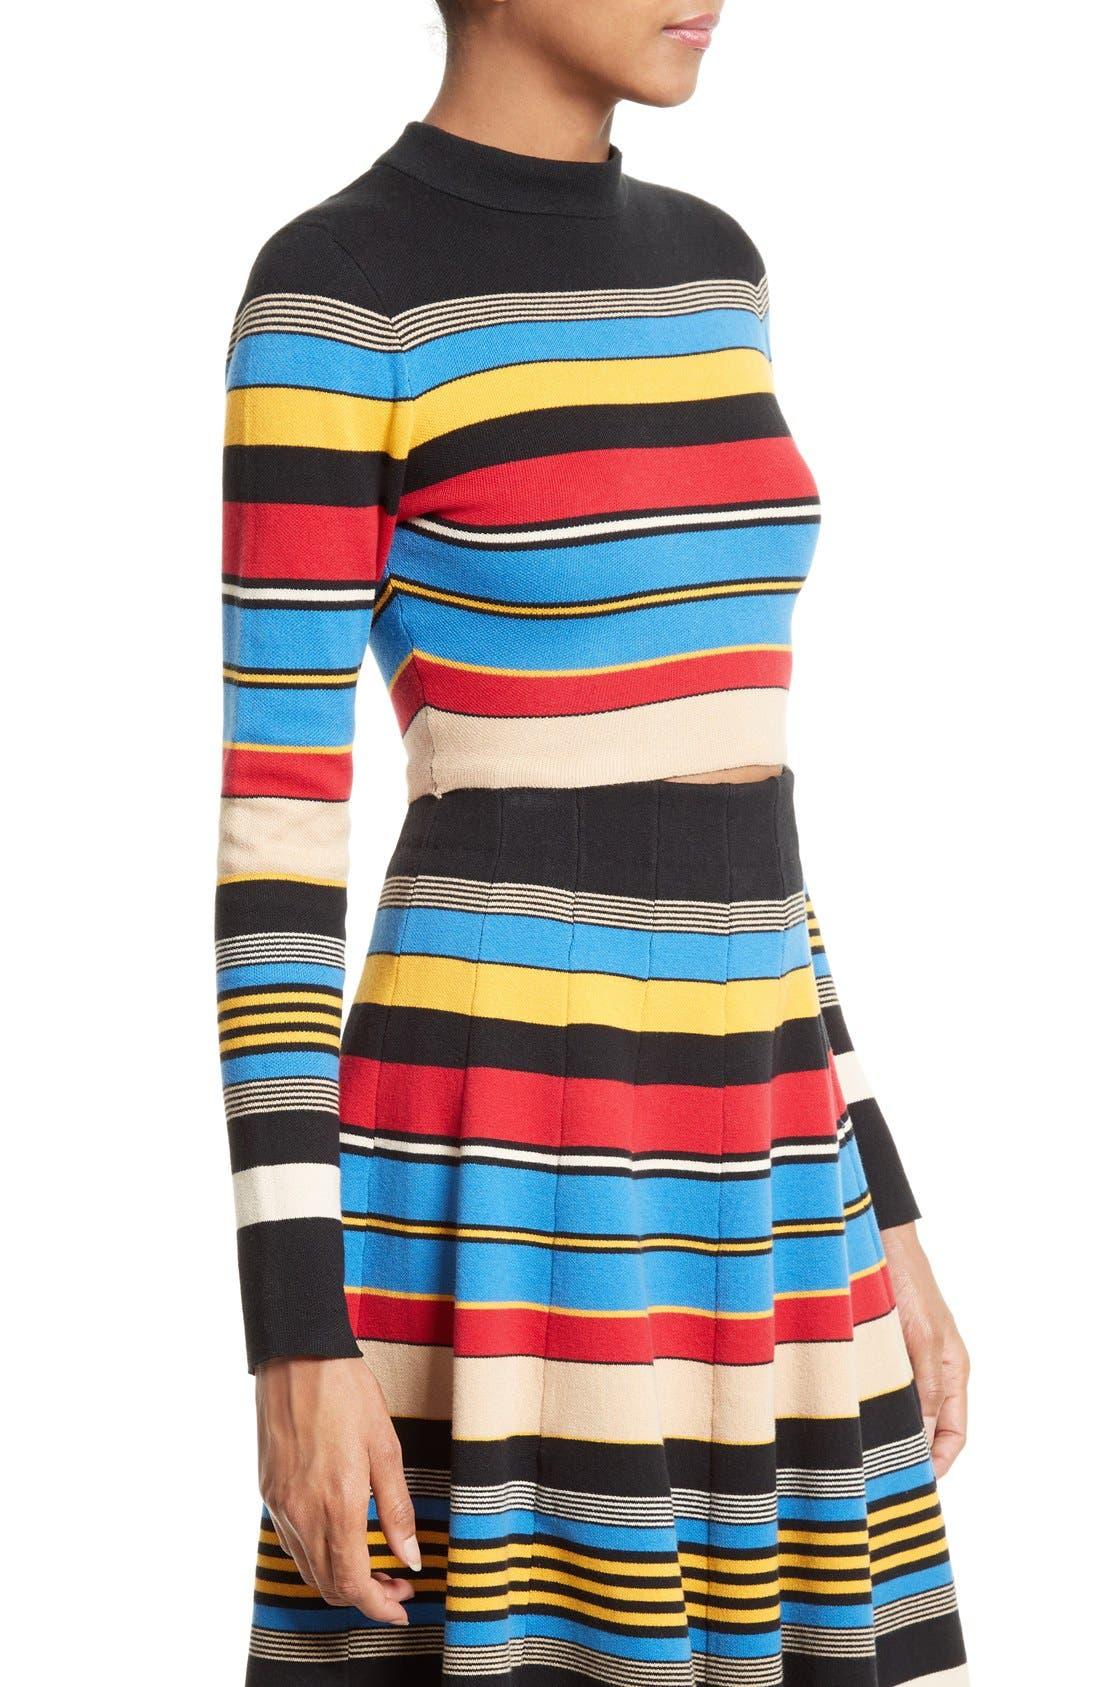 Stripe Crop Top,                             Alternate thumbnail 4, color,                             Multi